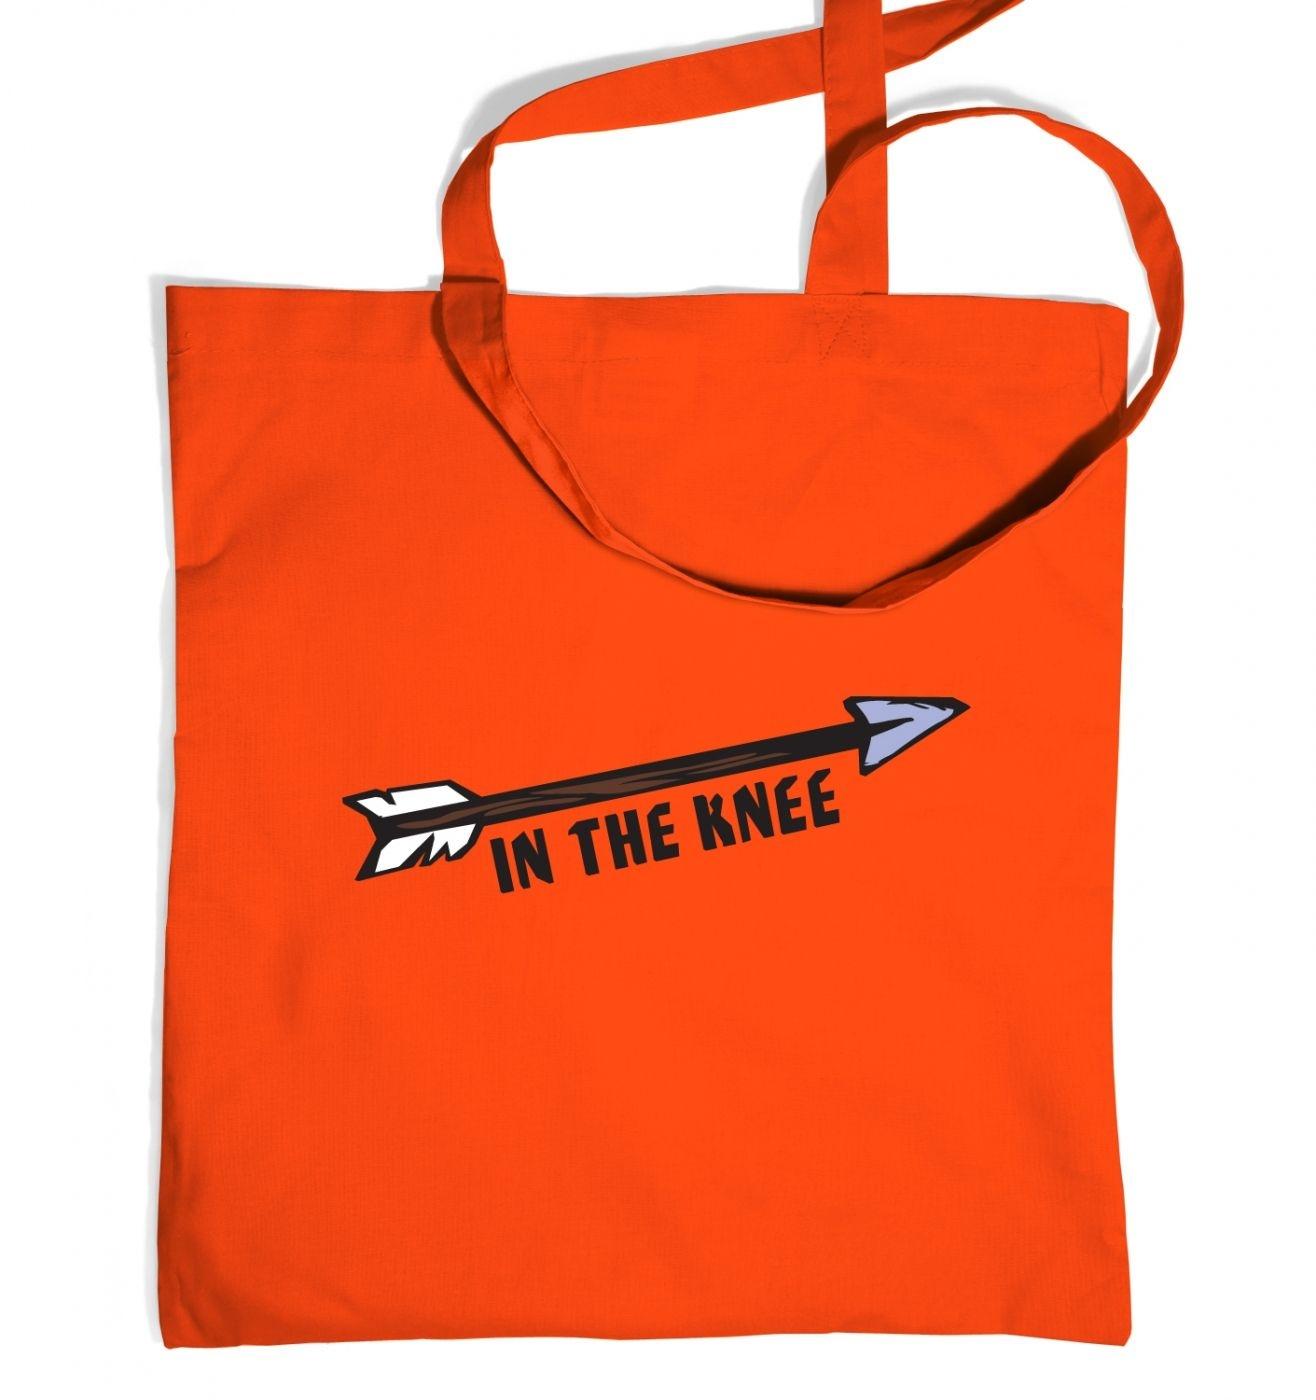 Cartoon Arrow In The Knee tote bag